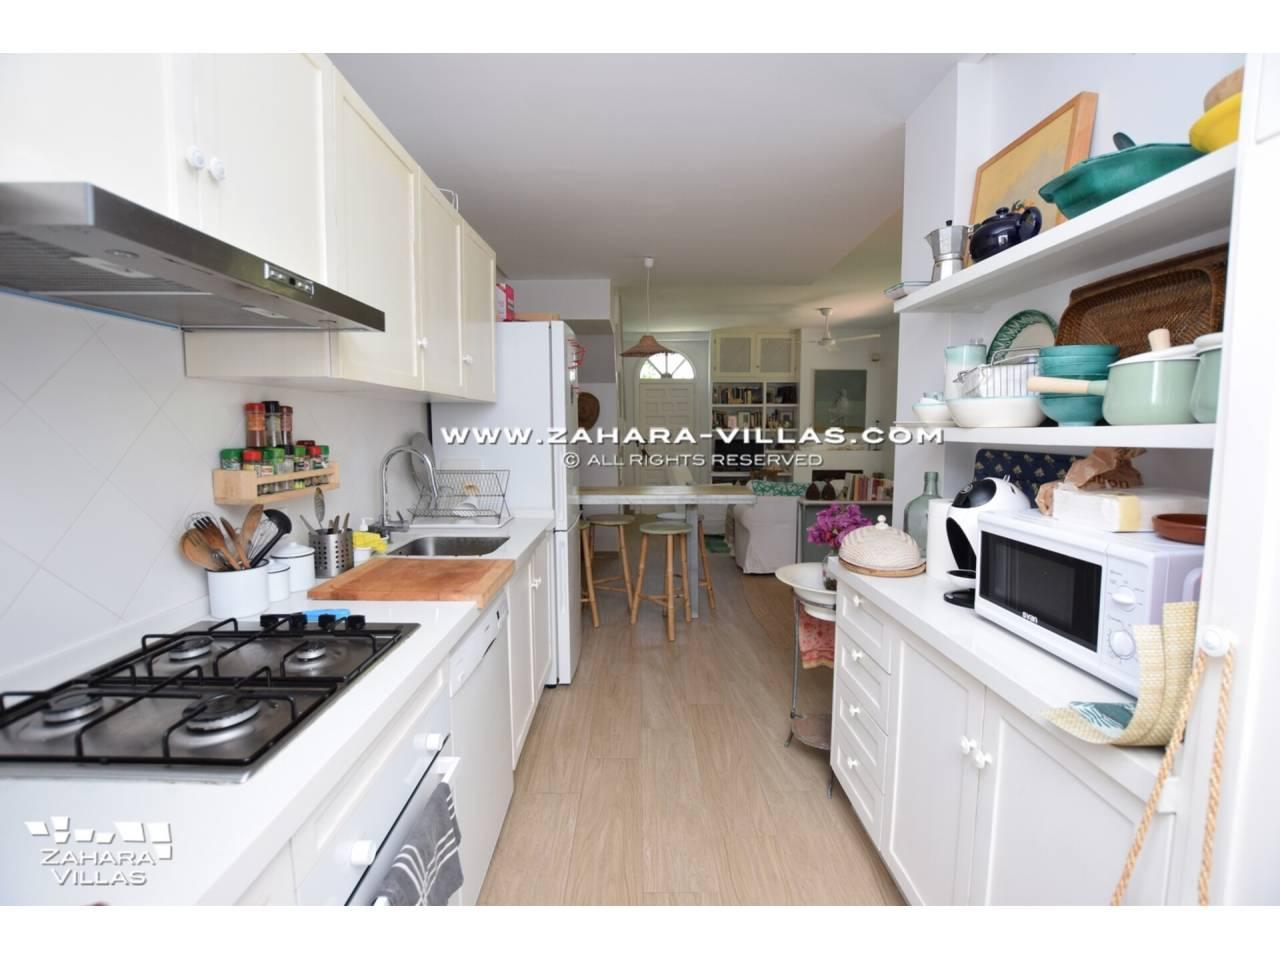 Imagen 6 de House for sale close to the beach, with sea views in Zahara de los Atunes